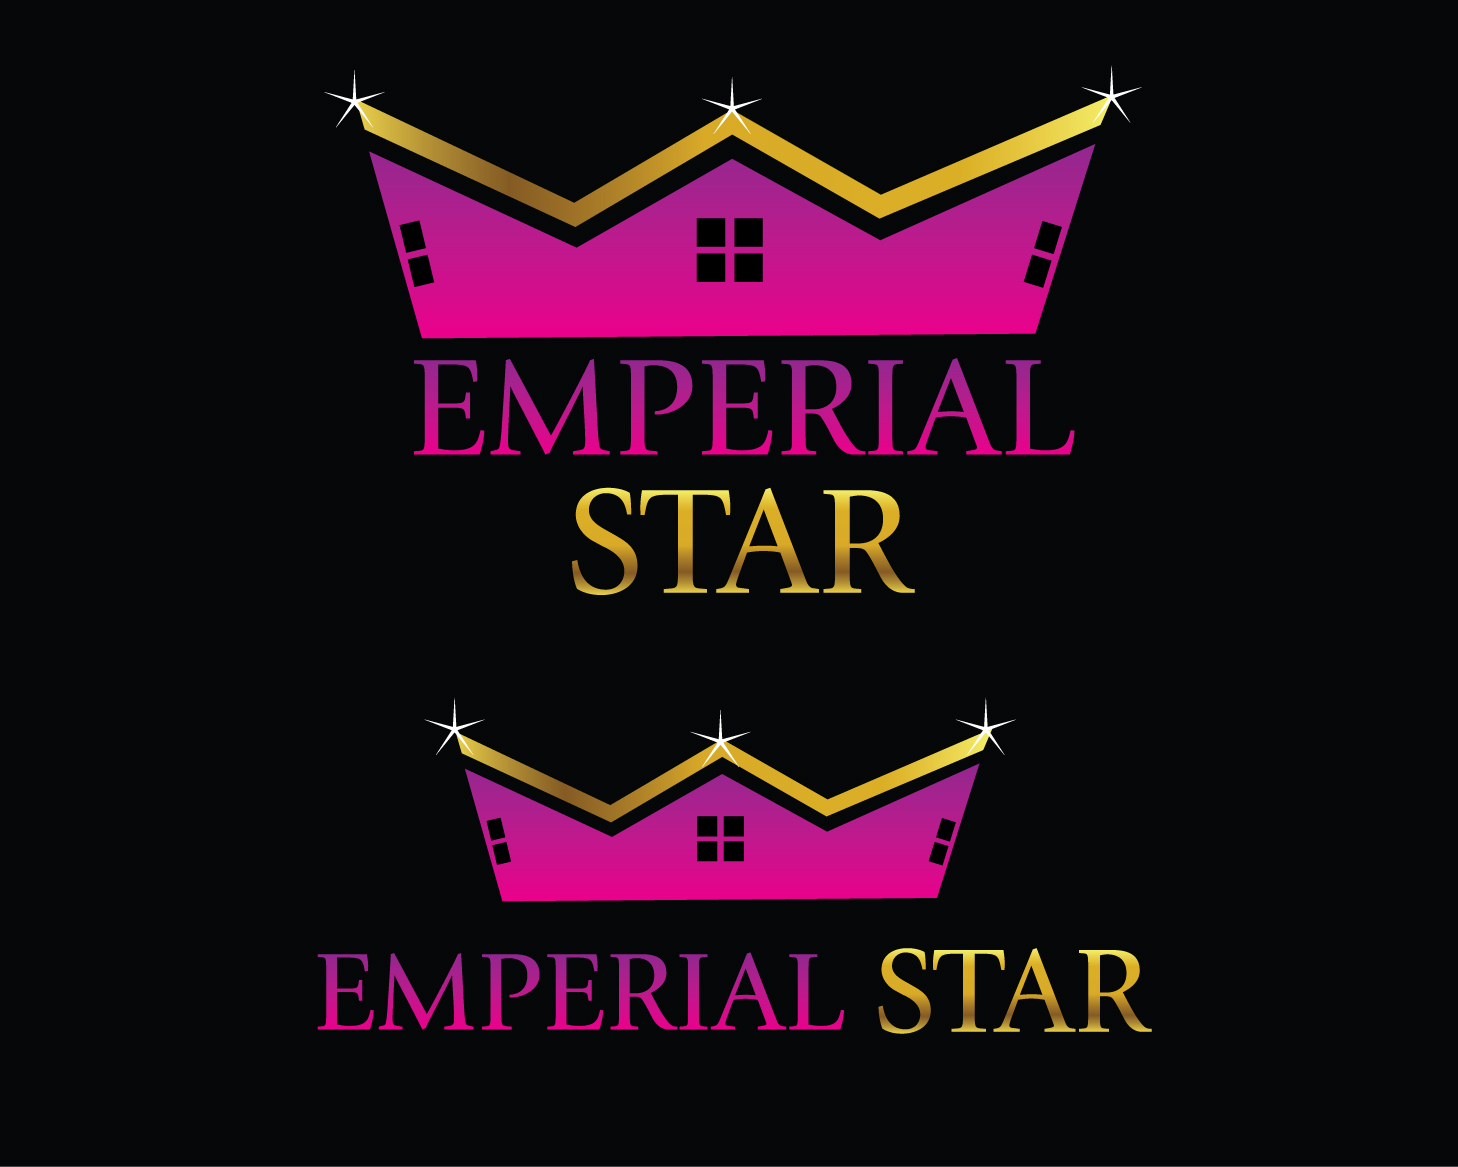 Logo Design by rA - Entry No. 79 in the Logo Design Contest Emperial Star Logo Design.